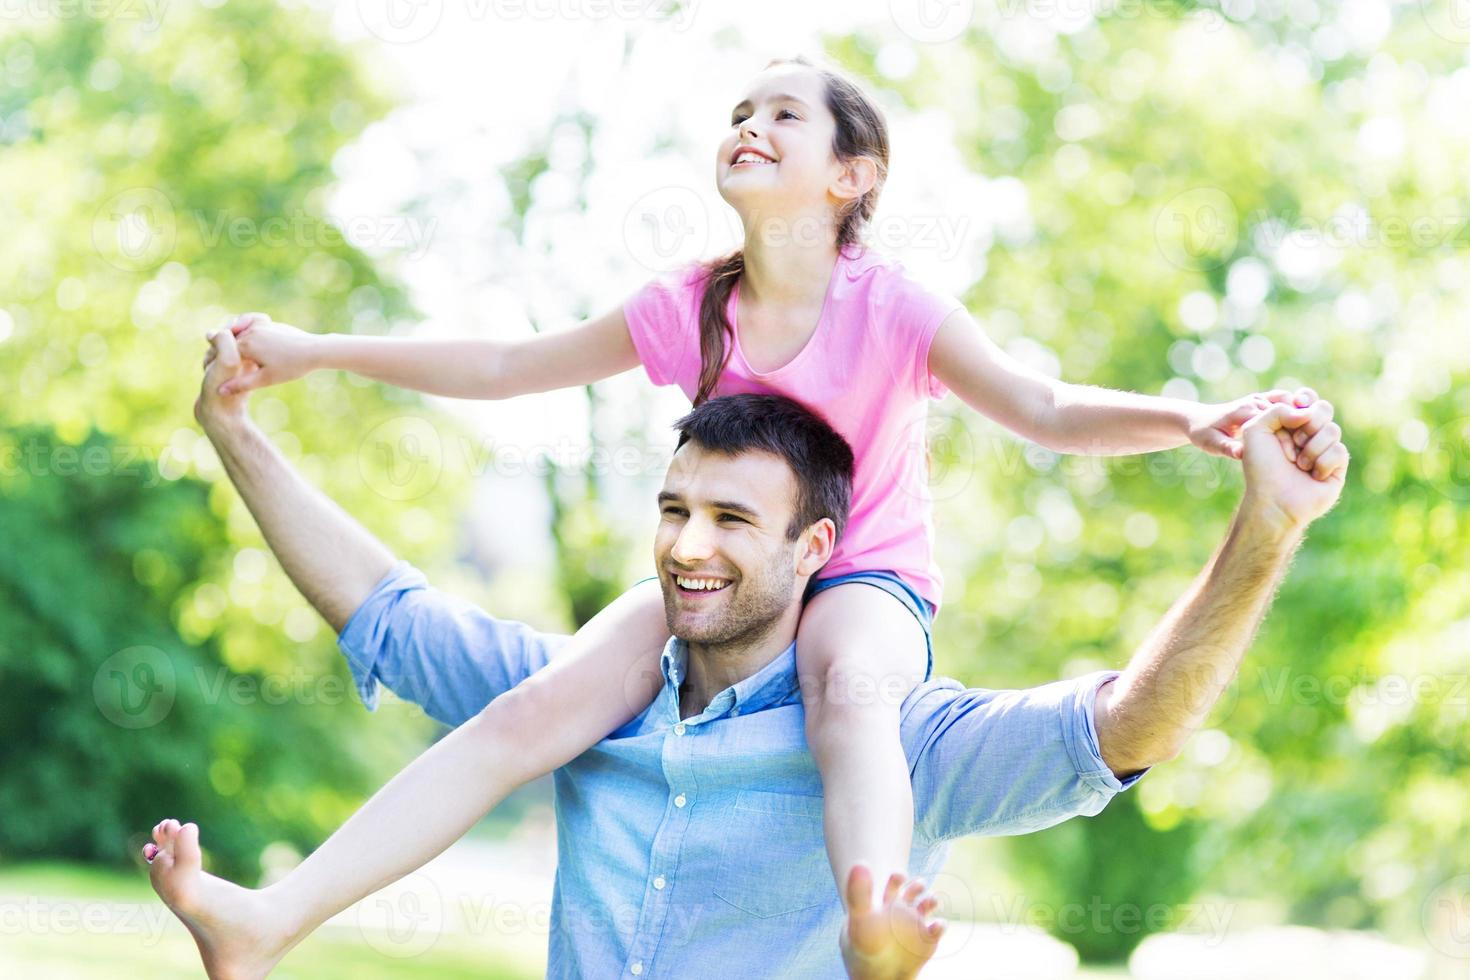 far som ger sin dotter en piggyback foto